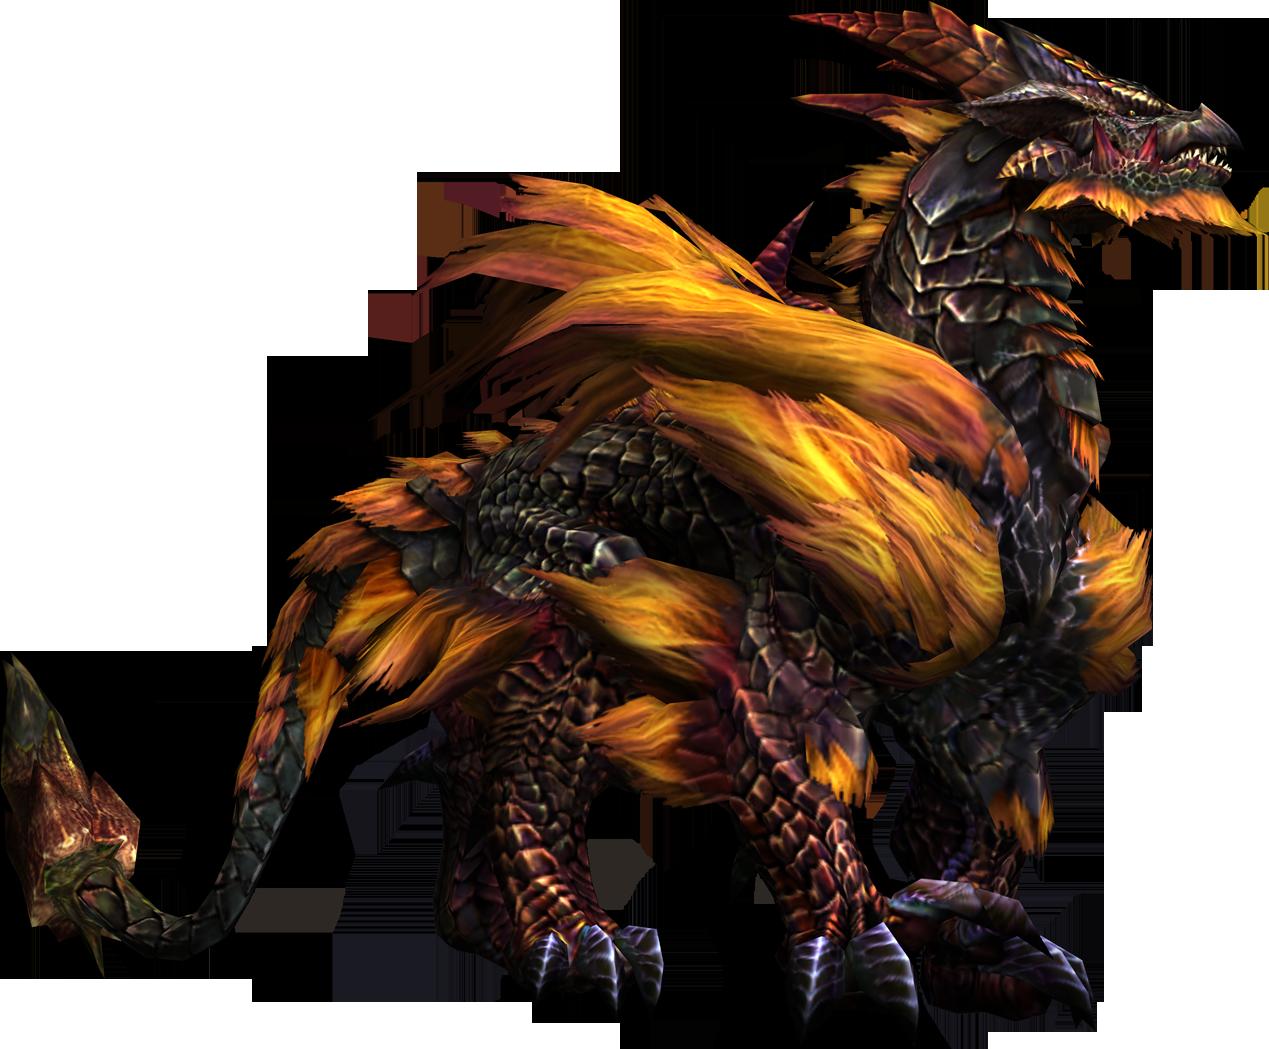 monster hunter 4g monster - Google 검색   monster_dragon   판타지 아트, 판타지 및 낙서